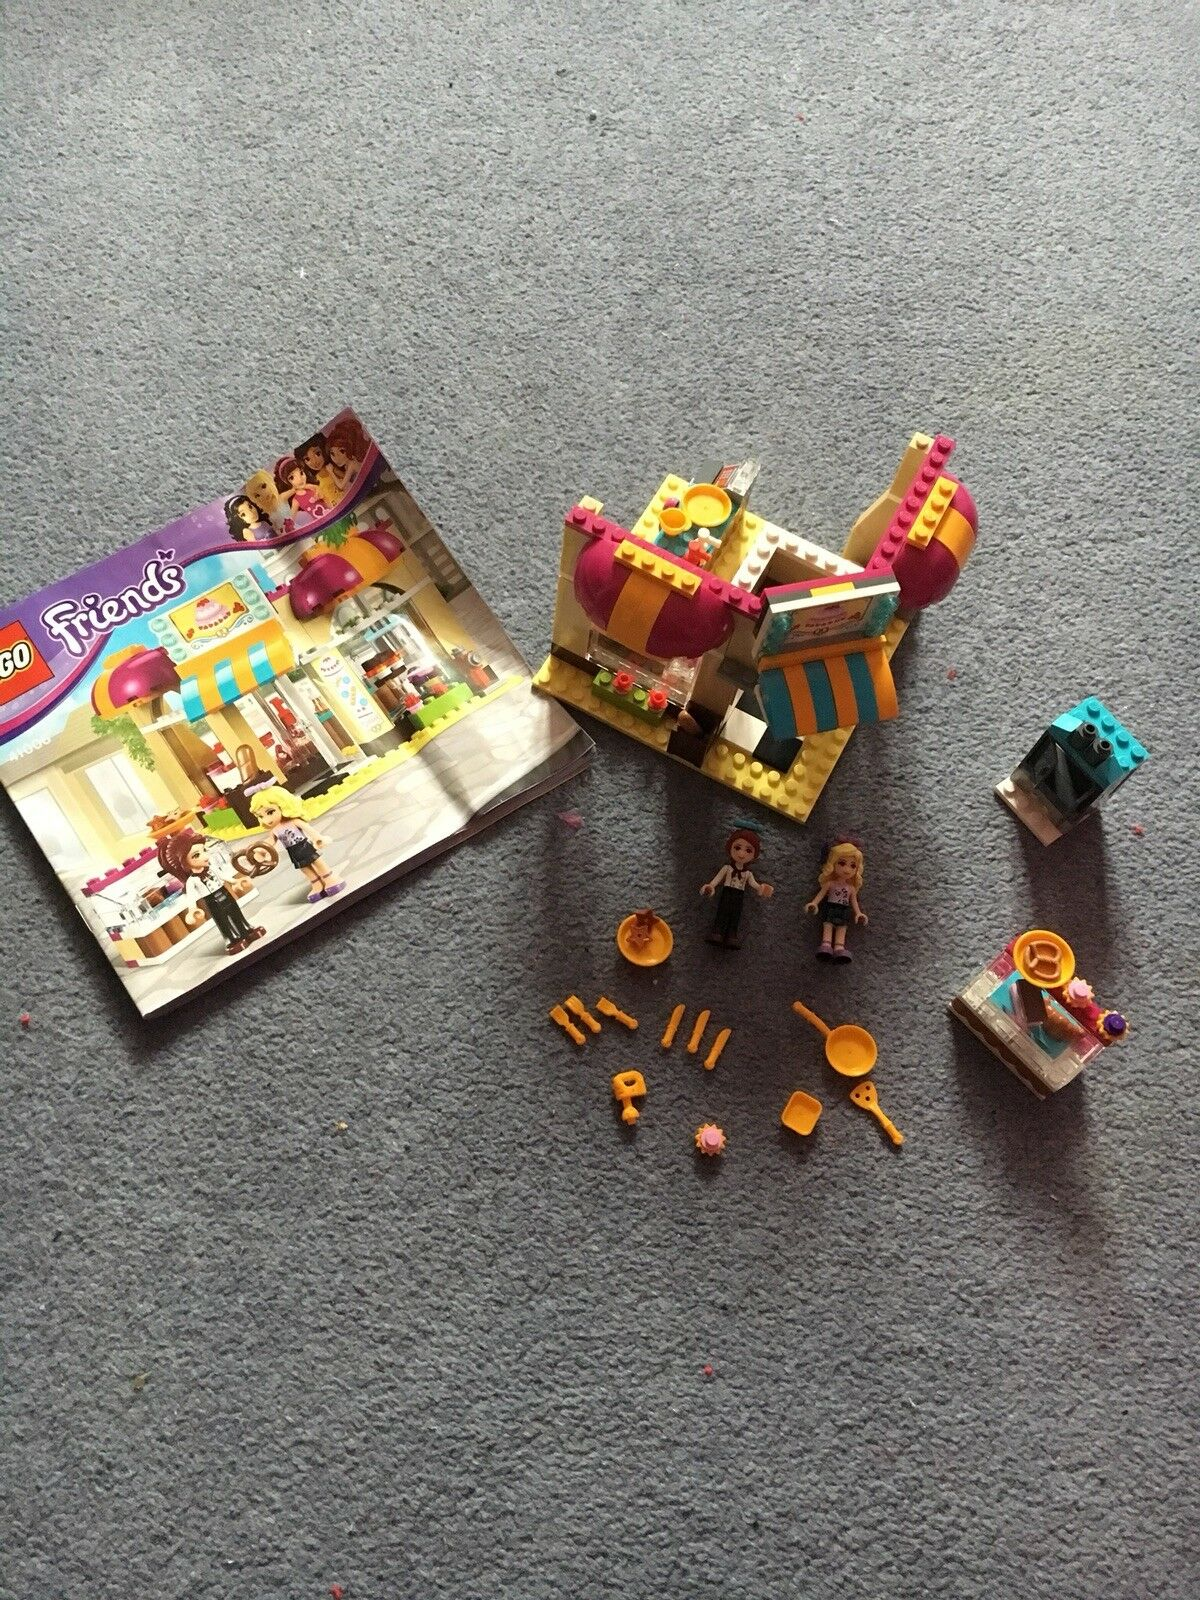 Lego friends bundle 12 set plus spares immaculate condition